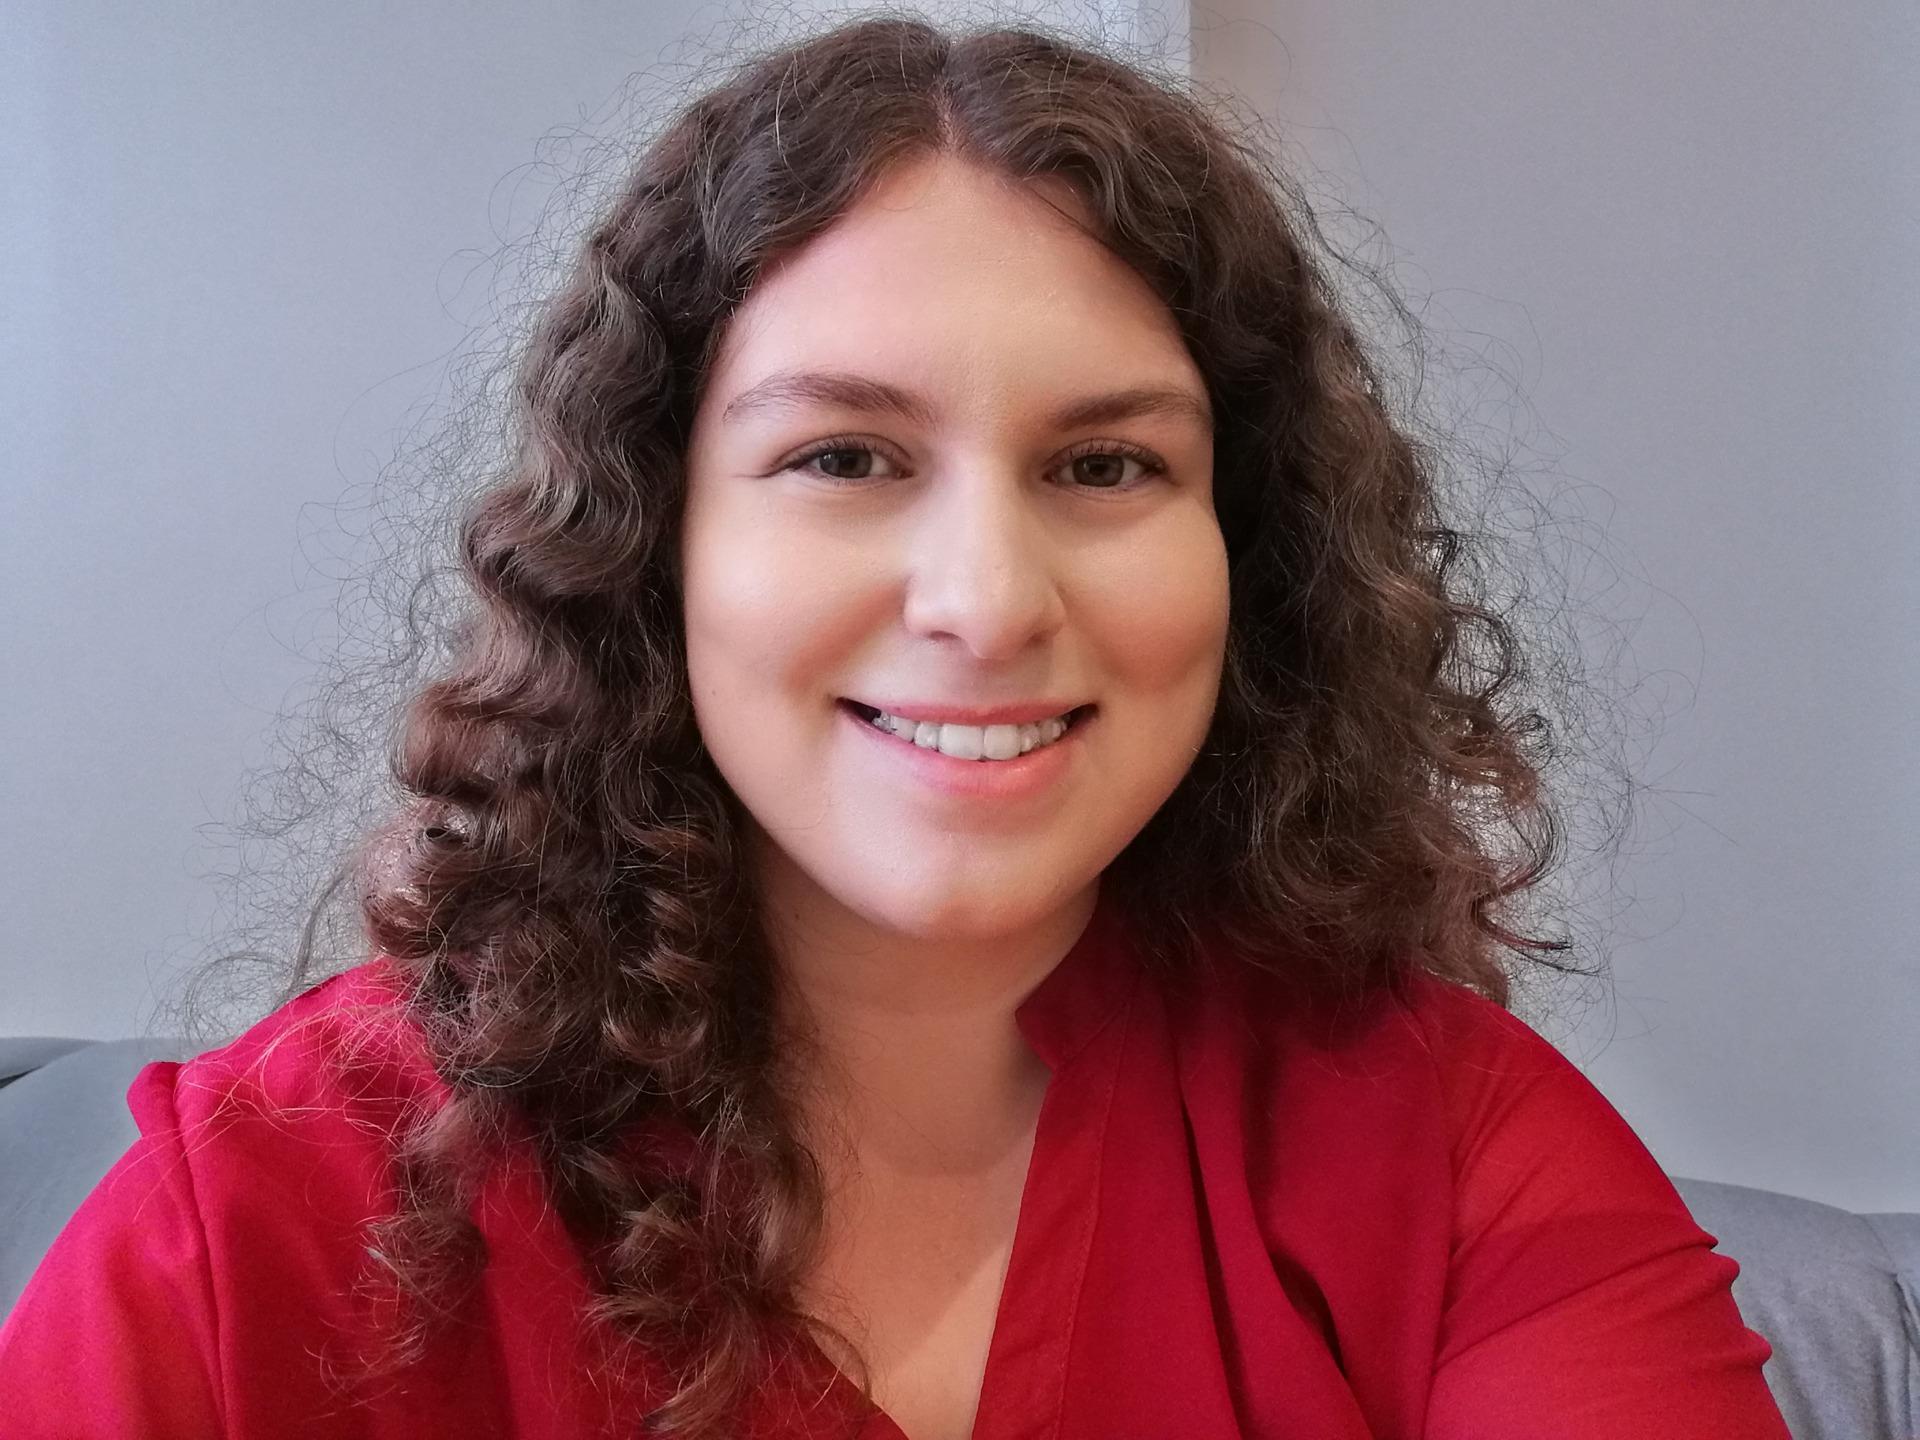 Joana Freitas - Autora do Miss Poupança